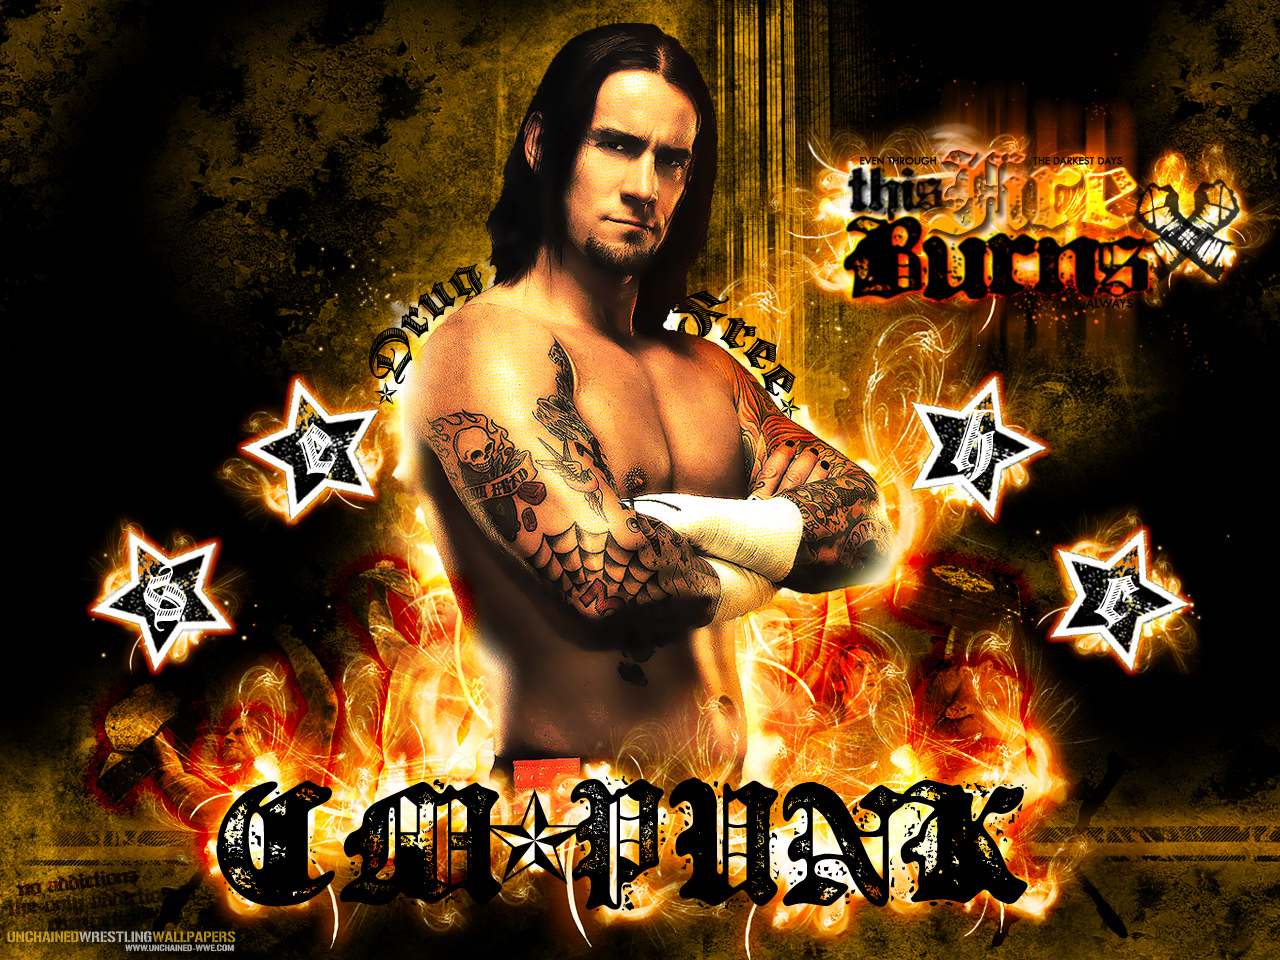 http://3.bp.blogspot.com/-8SmMUpTGJC8/TlEcE-FzrkI/AAAAAAAAADg/gfwQyUlea9M/s1600/WWE-Wallpapers-6.jpg